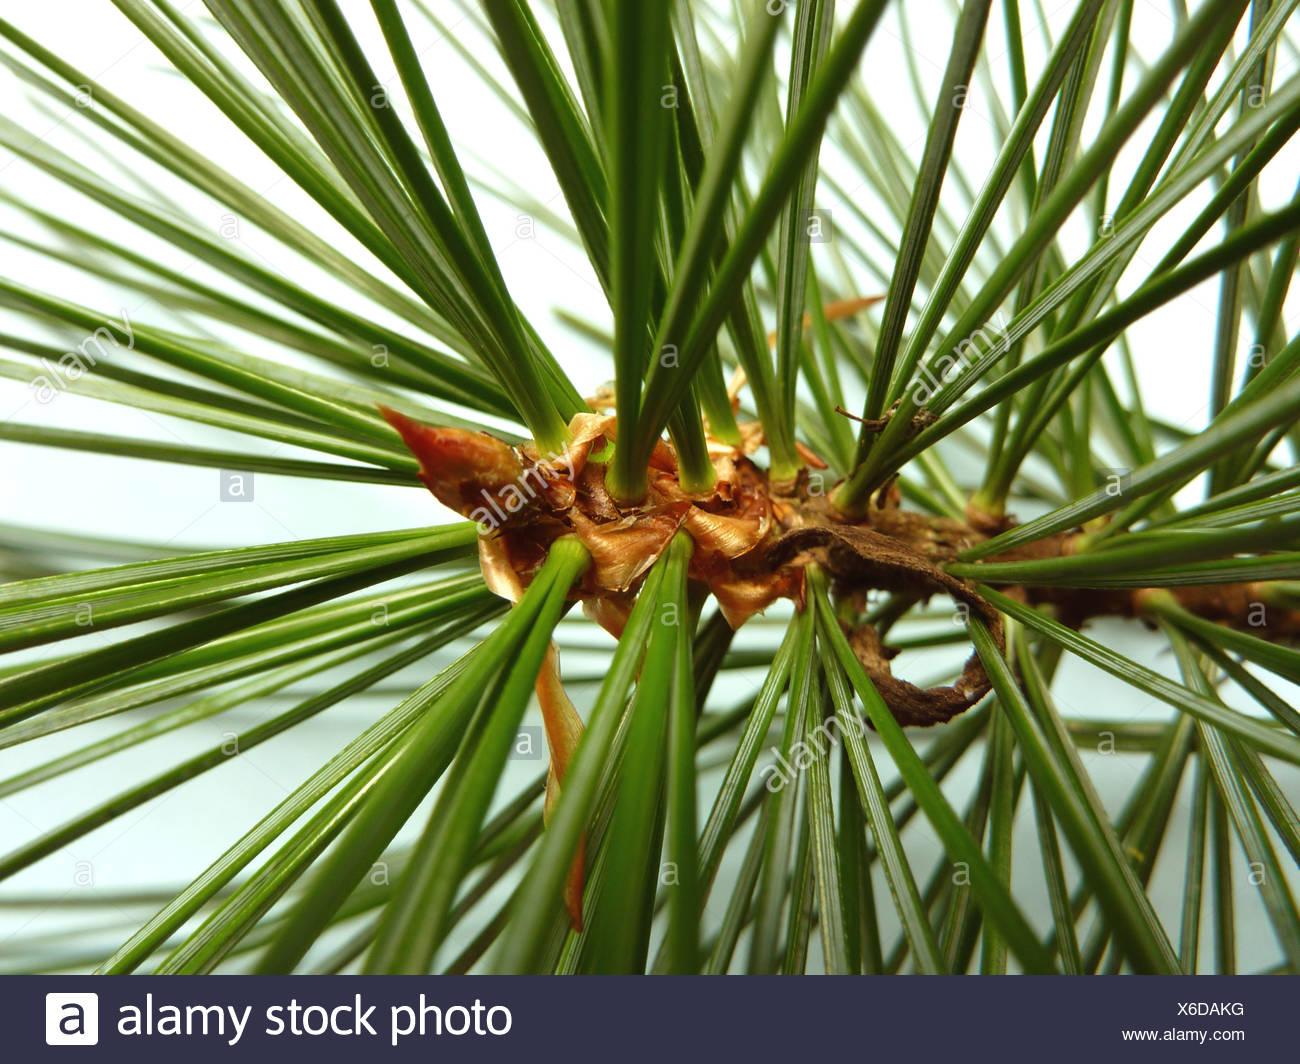 Korean pine (Pinus koraiensis), branch with needles Stock Photo